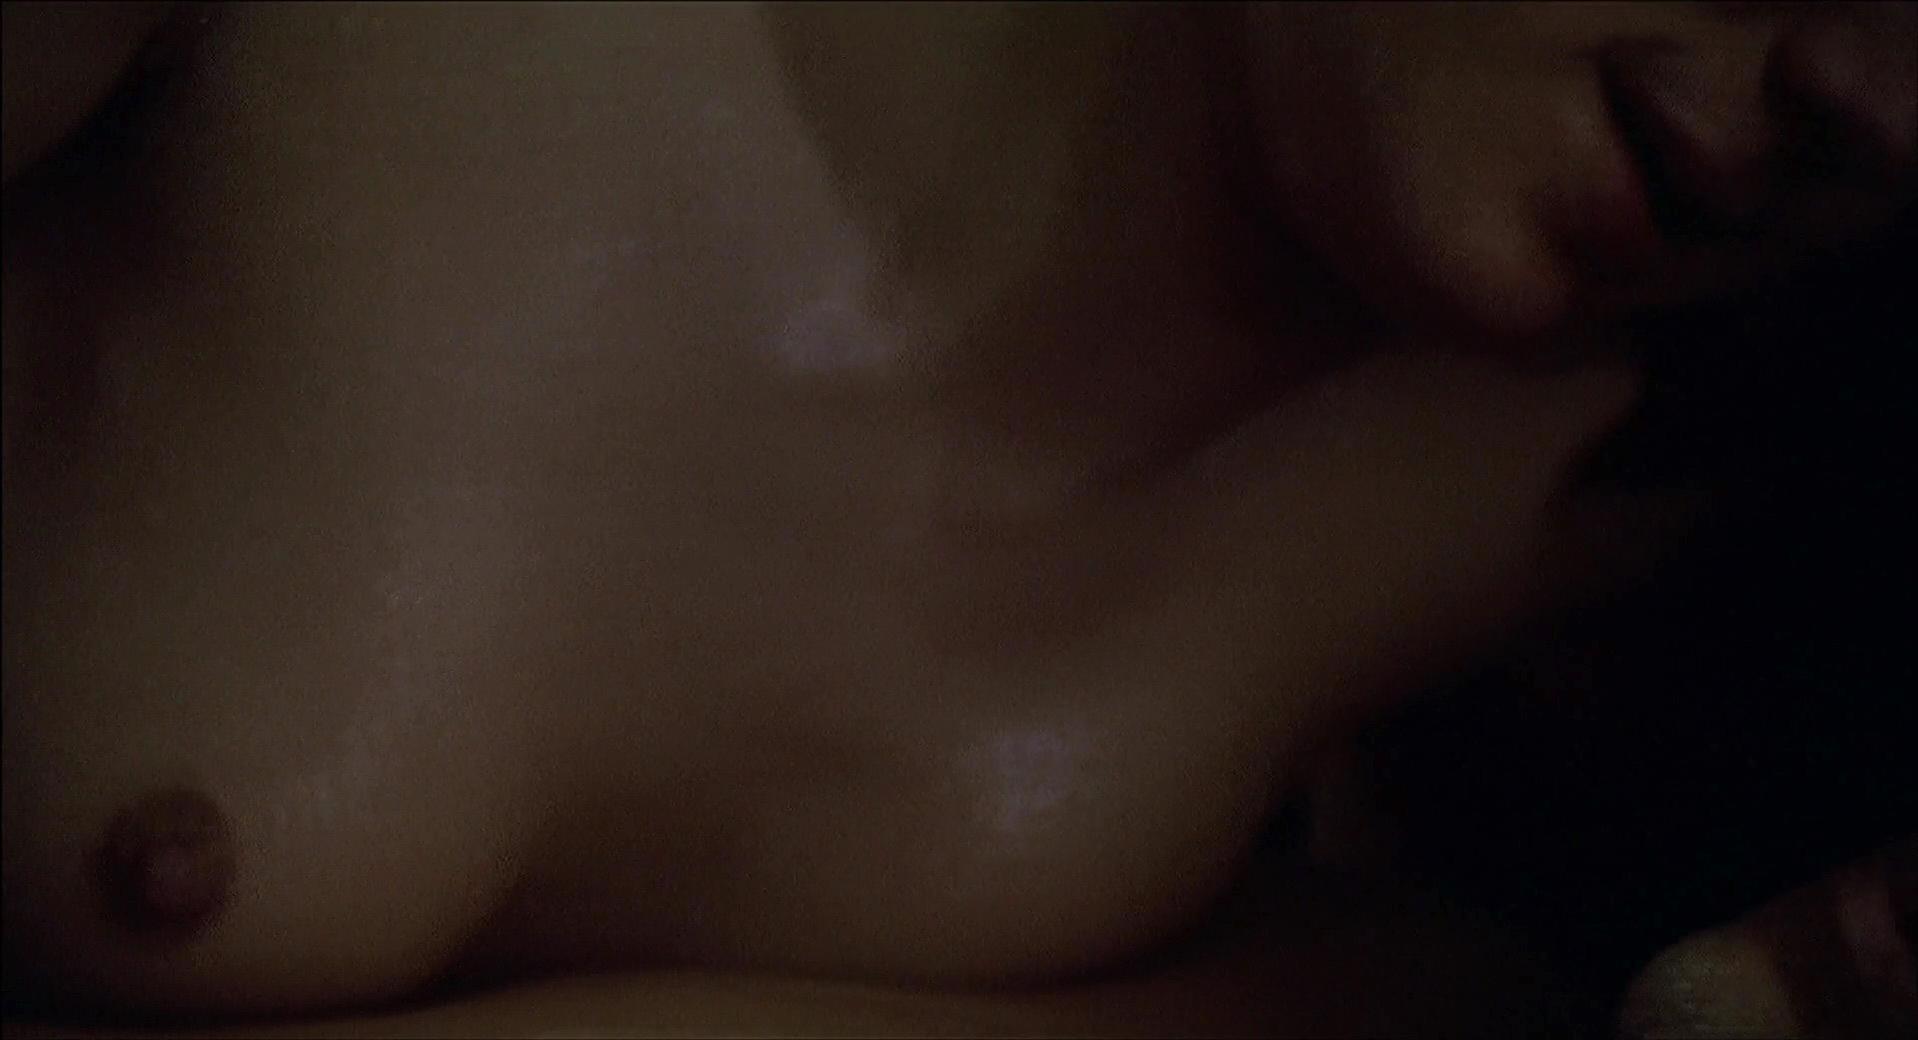 Elizabeth McGovern nude, Ellen Barkin sexy - Johnny Handsome (1989)